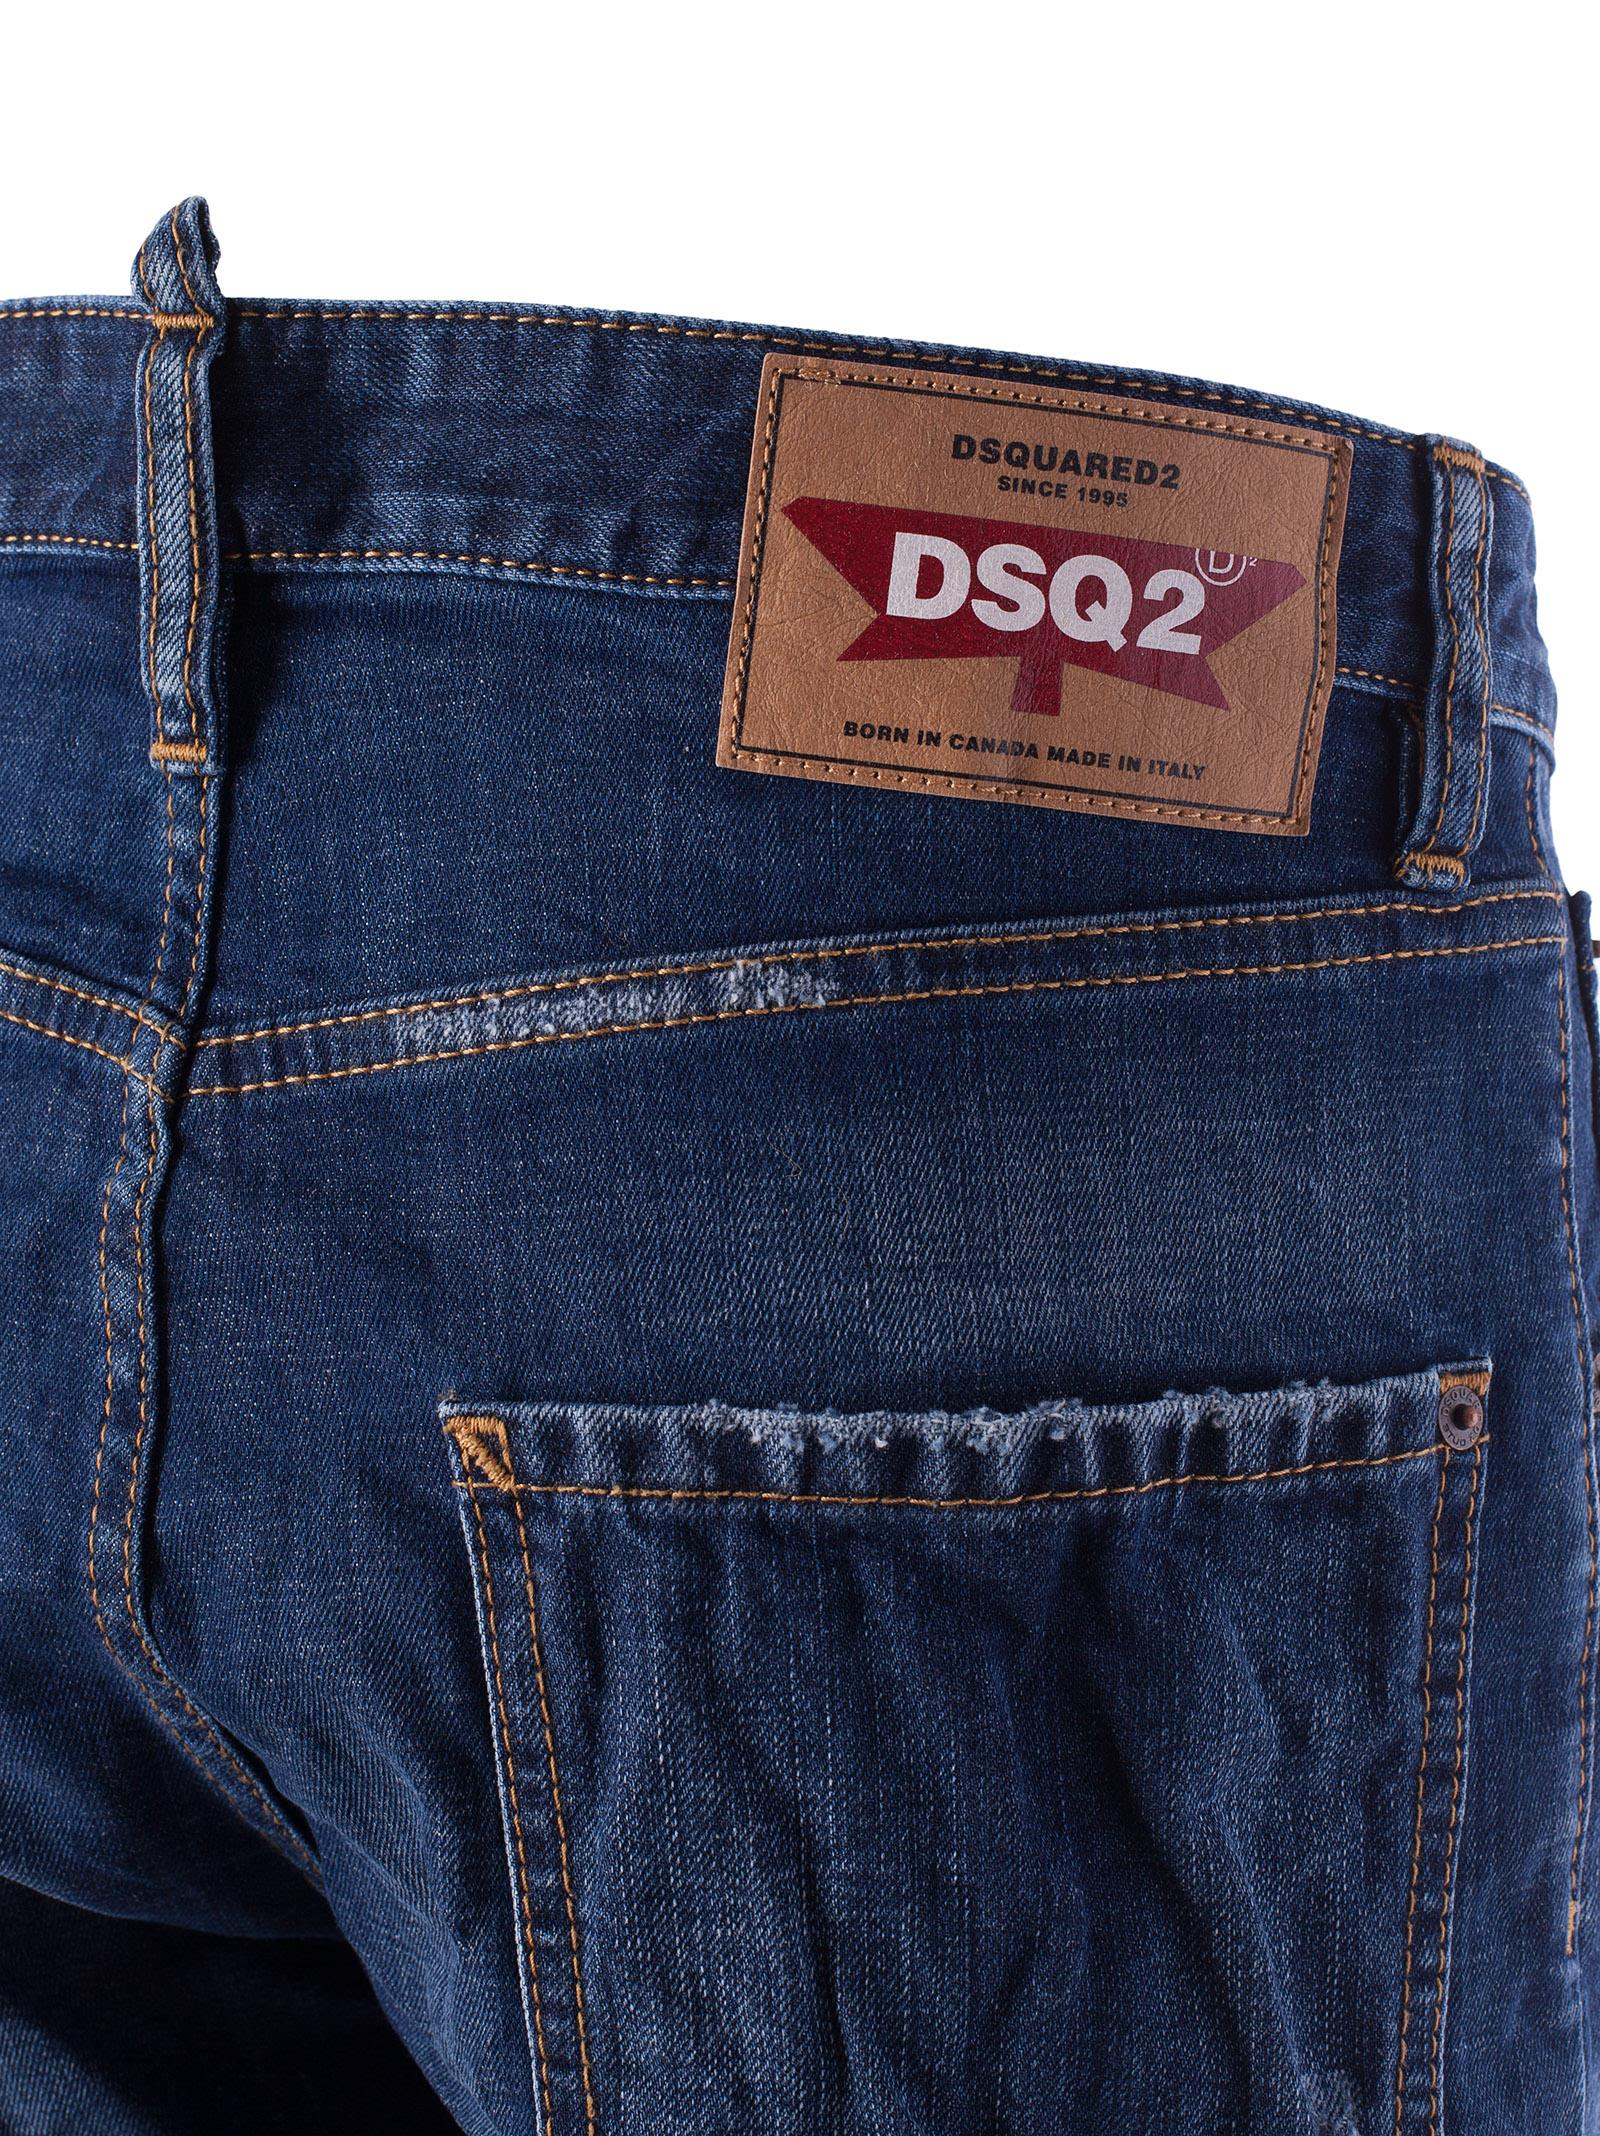 Release Dates Cheap Price stonewash effect denim shorts - Blue Dsquared2 Quality Free Shipping xzH4NH3B